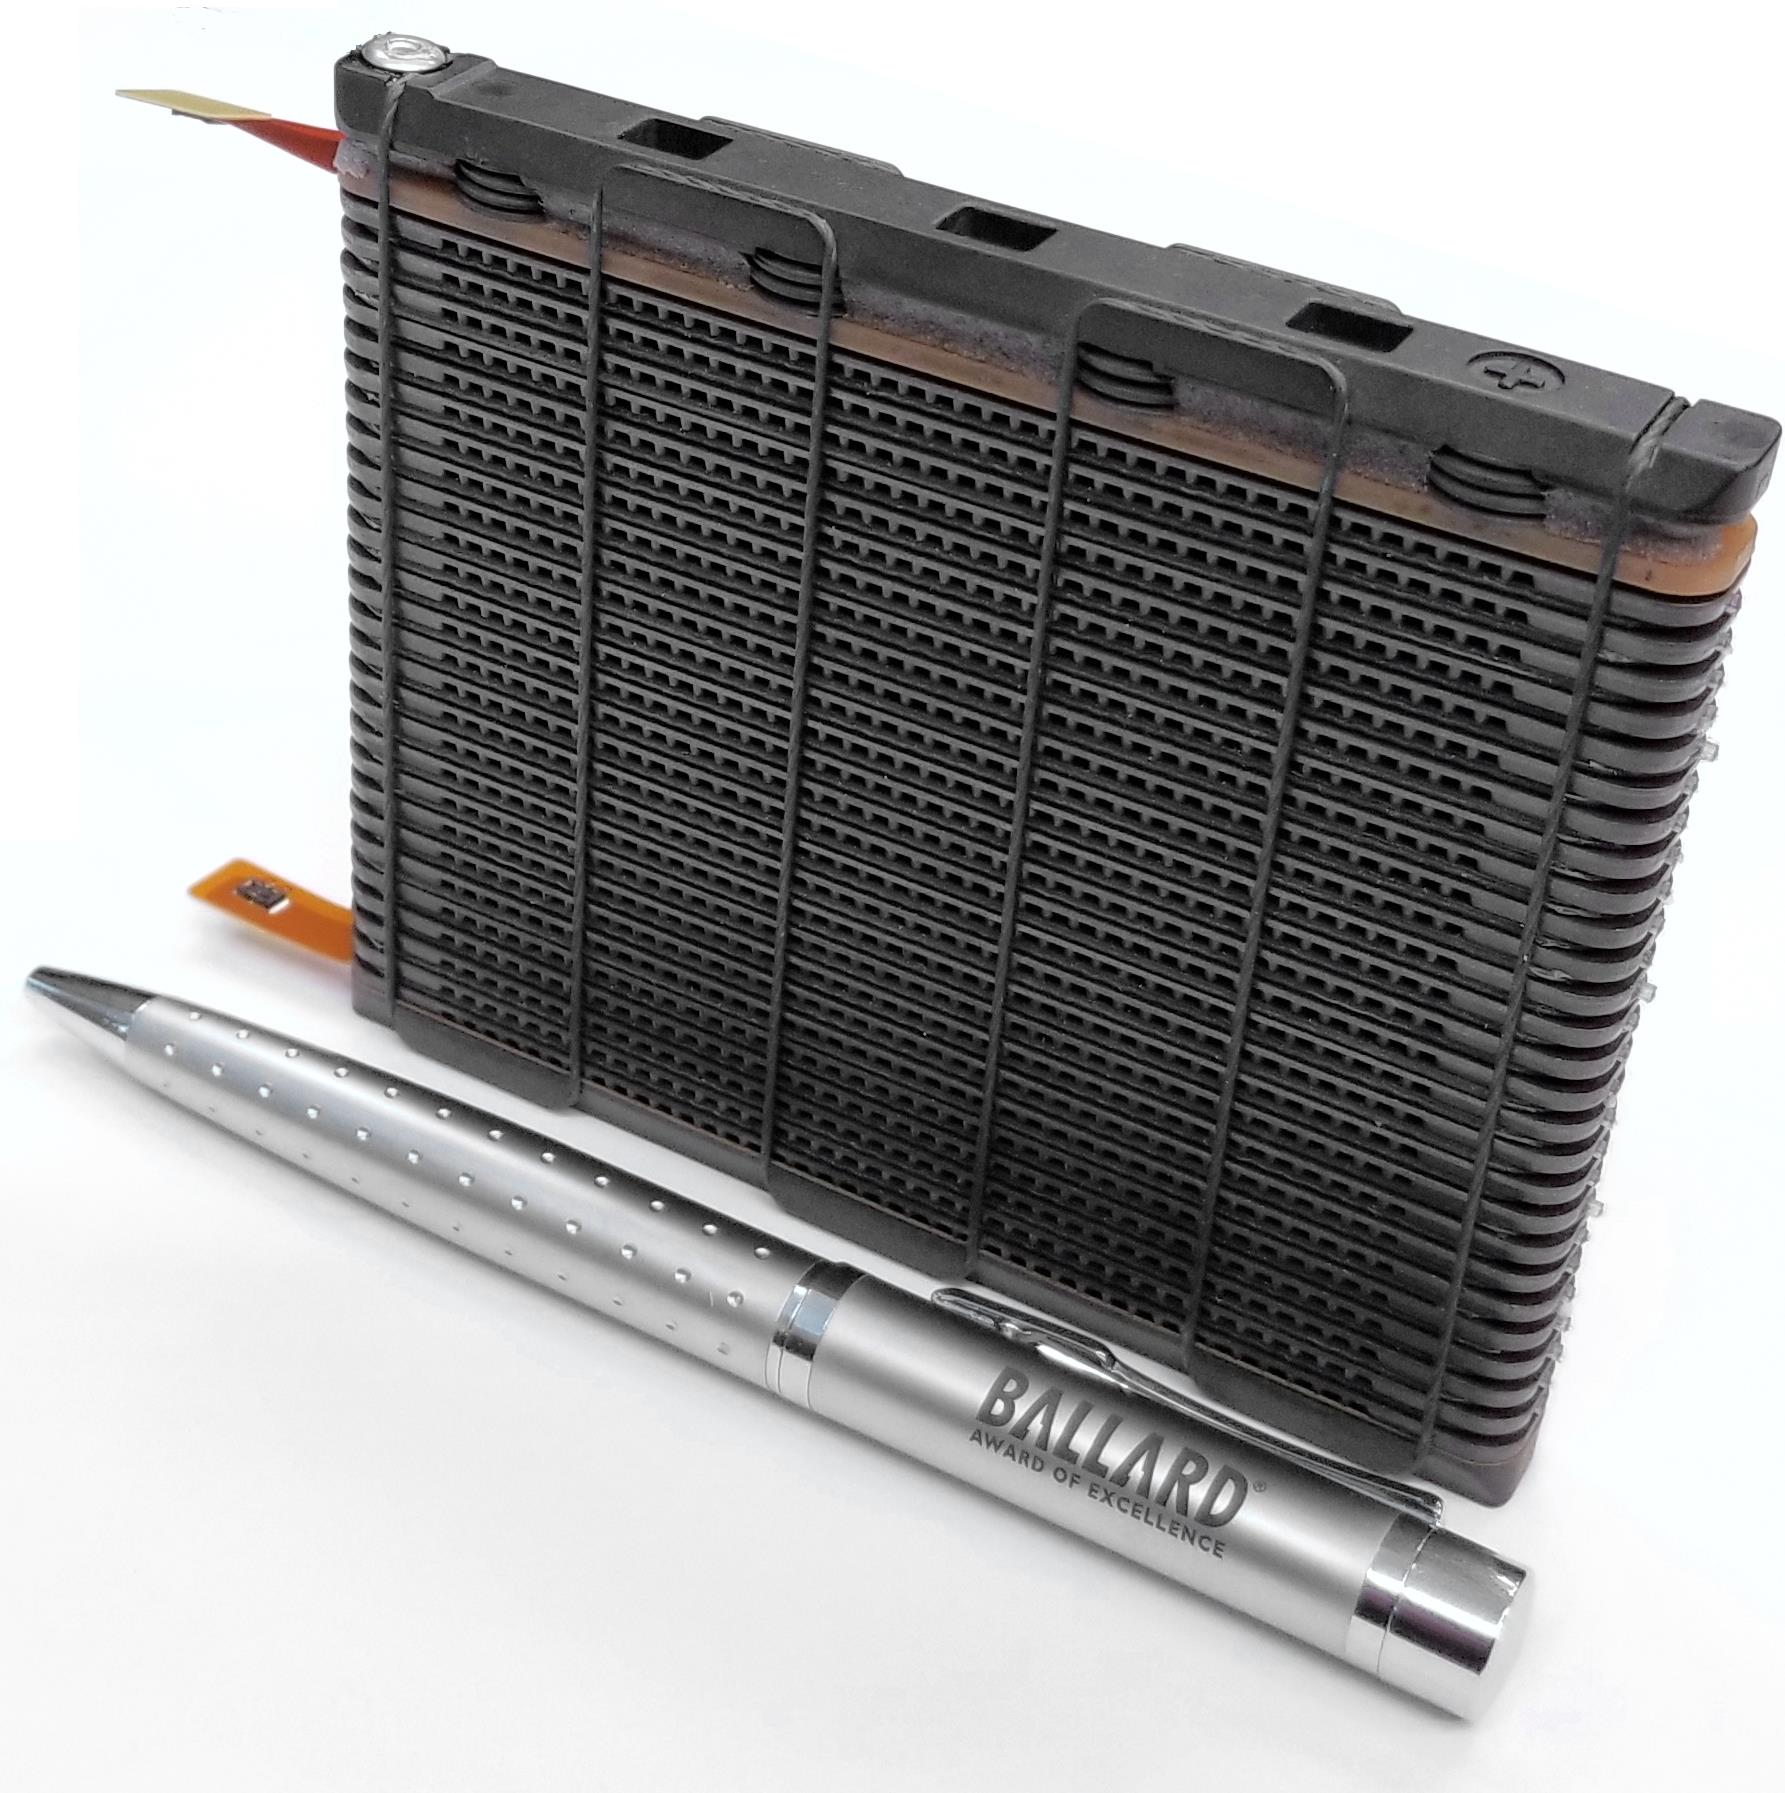 FCgen-1040-prototype-fuel-cell-stack.jpg